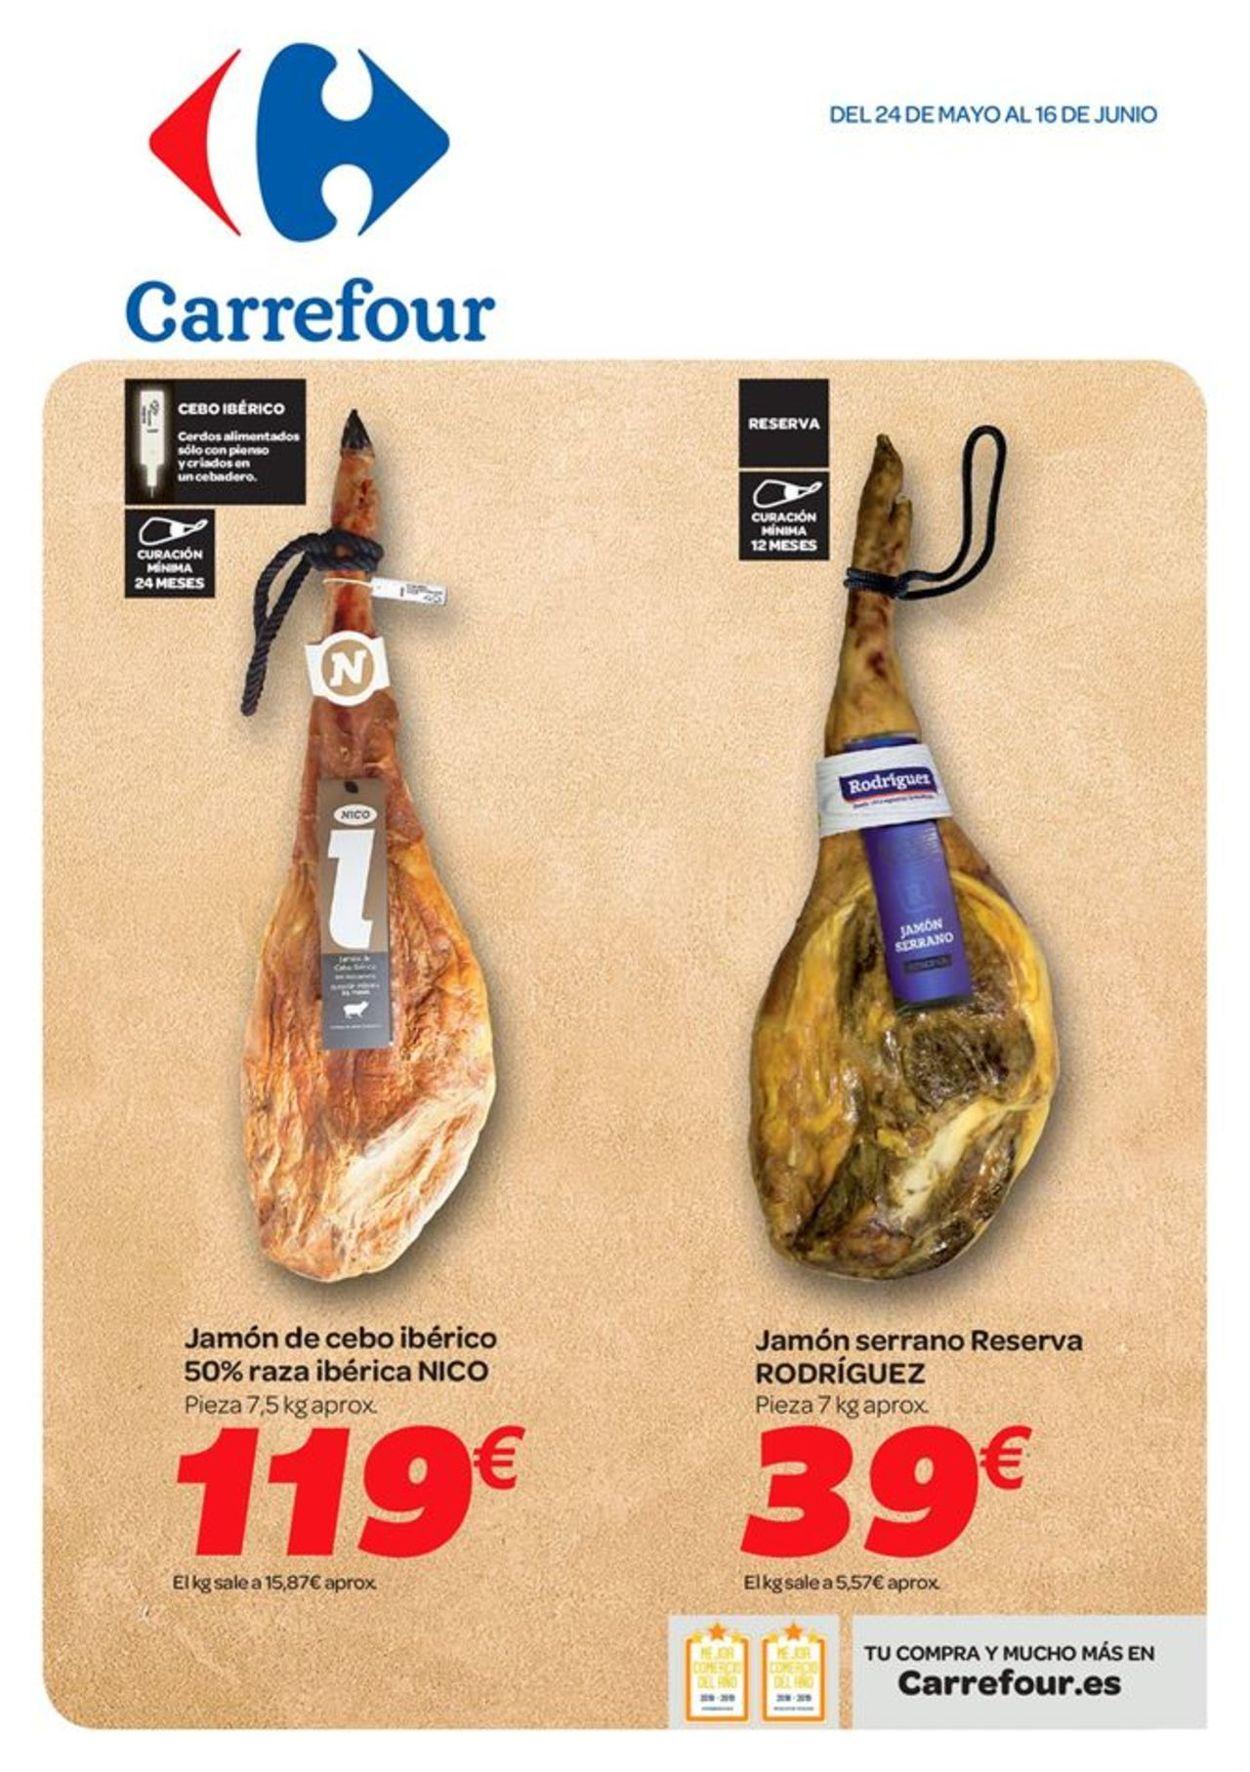 Carrefour Folleto - 24.05-16.06.2019